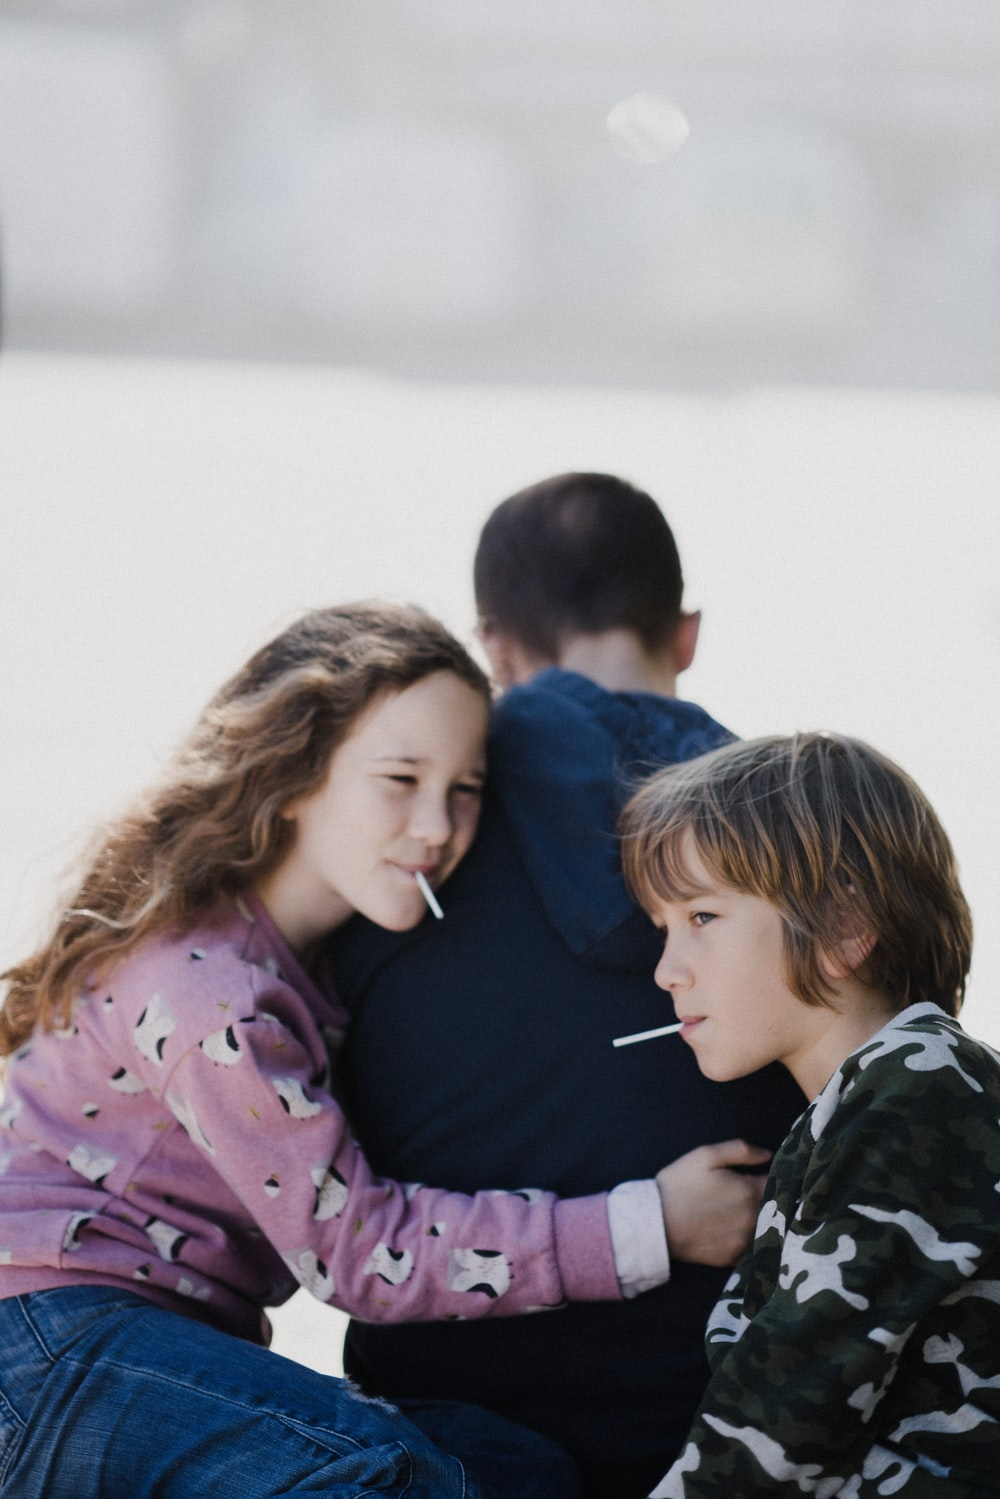 girl and boy eating lollipop